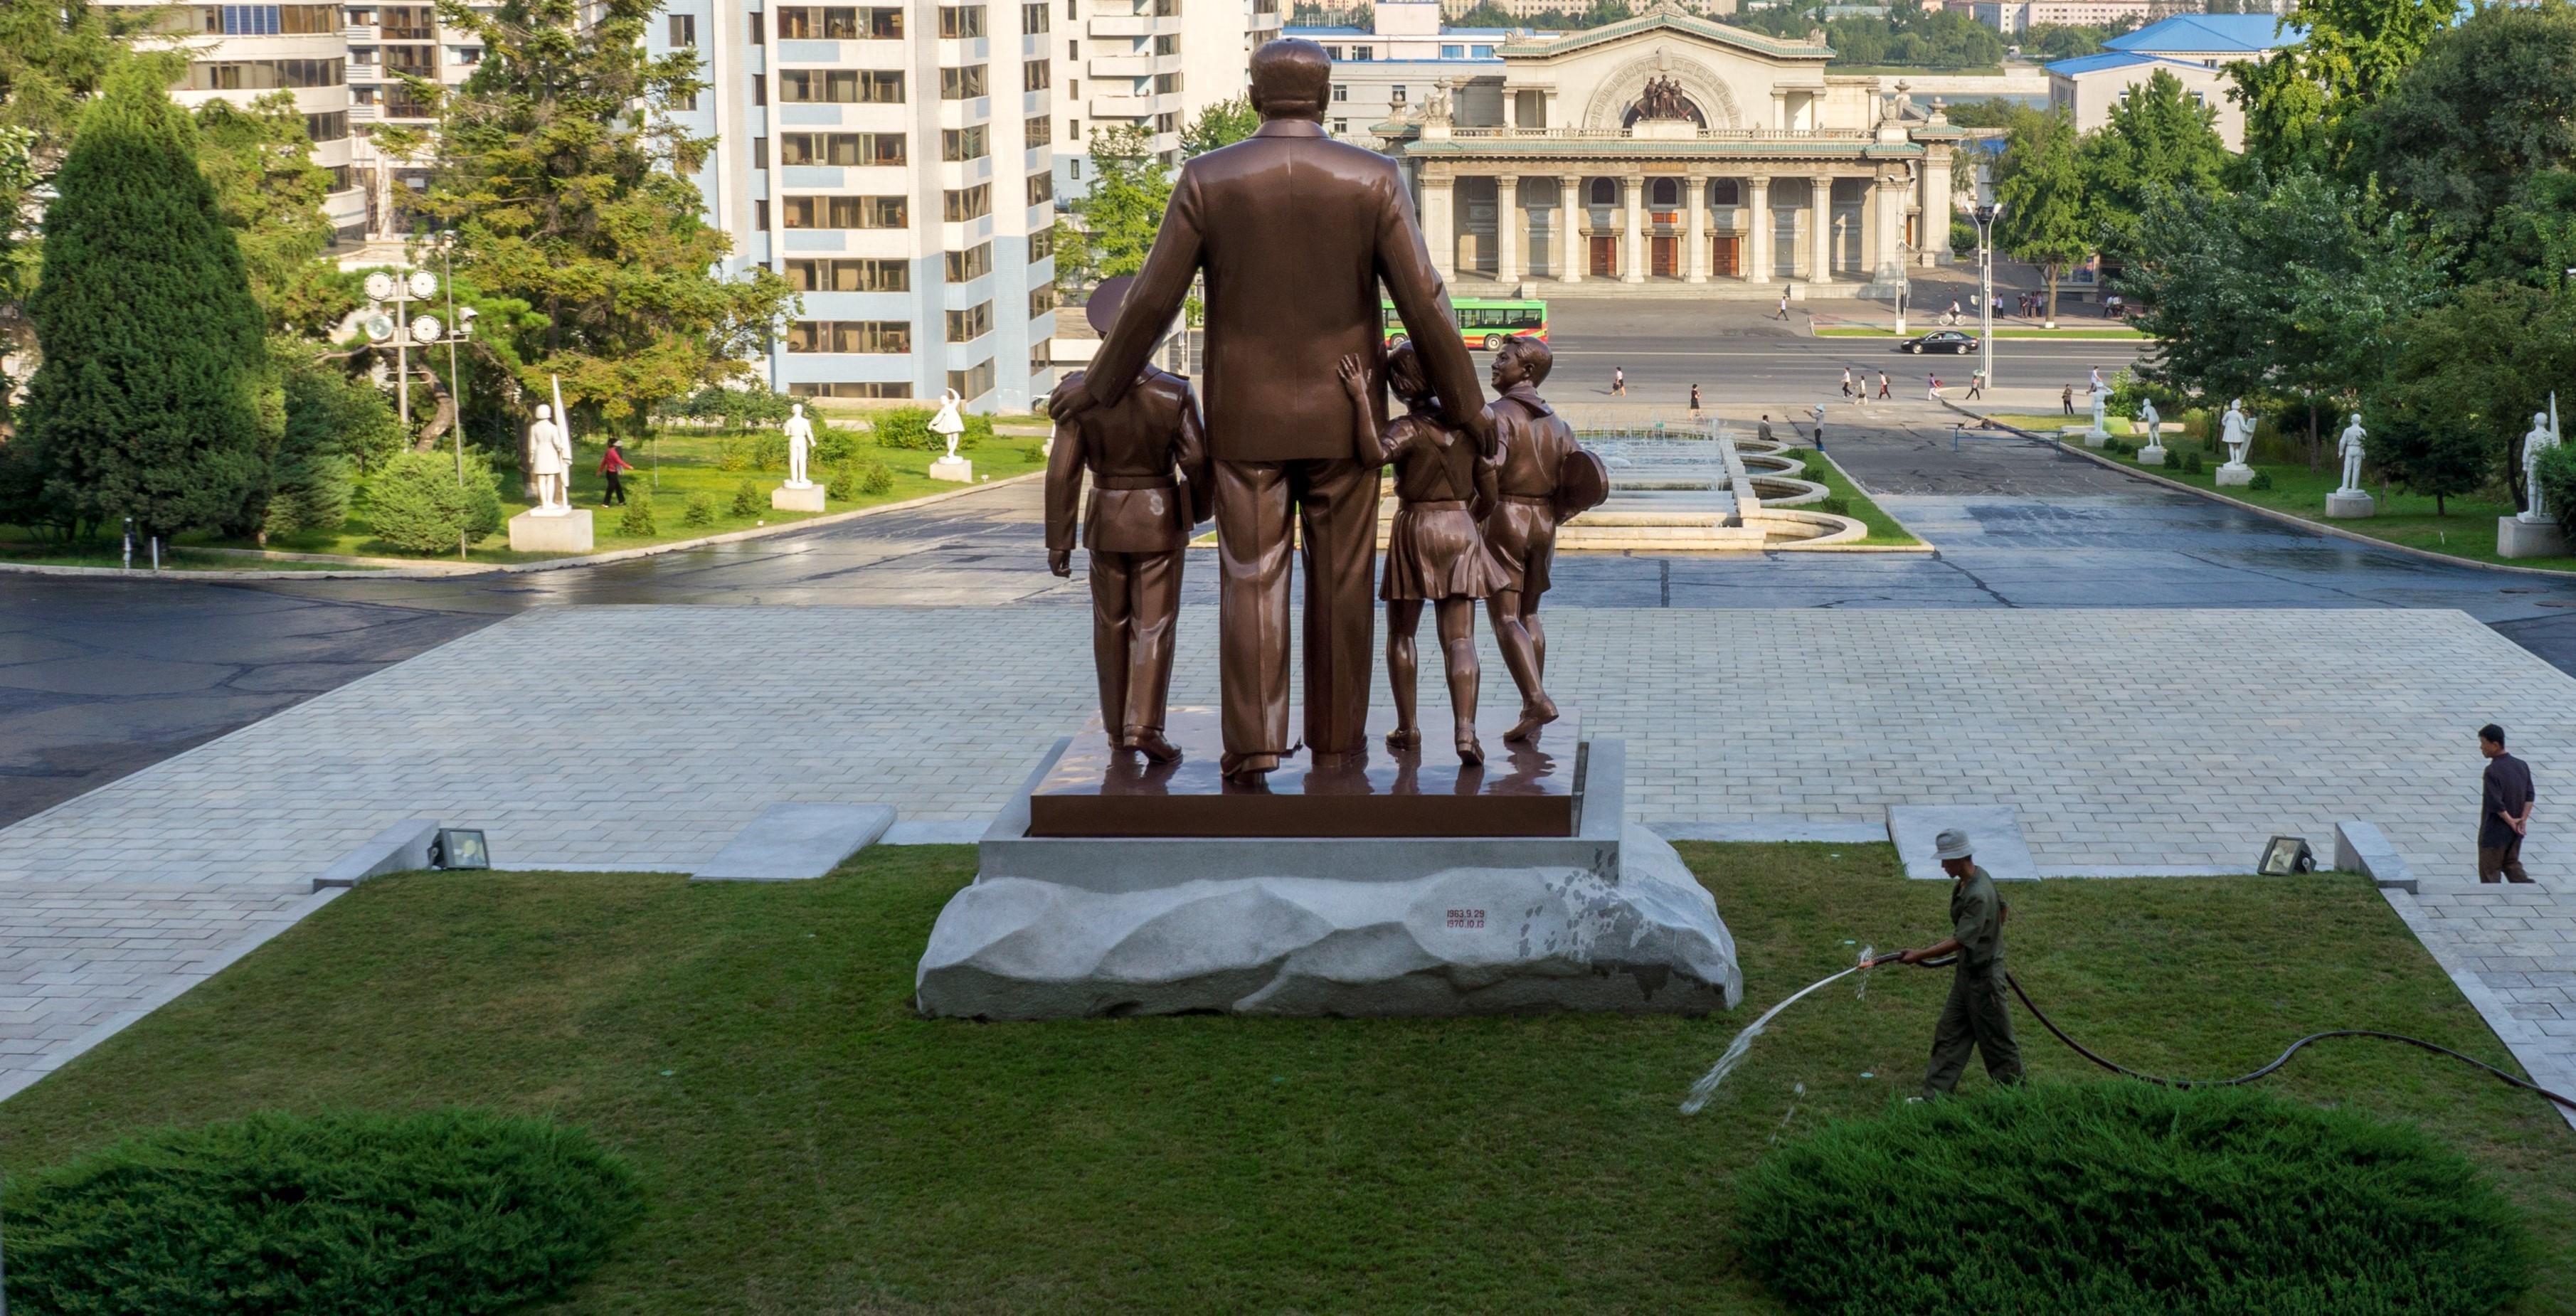 Statue of Kim II-sung, North Korea (Photo: Mario Micklisch/Wikimedia)